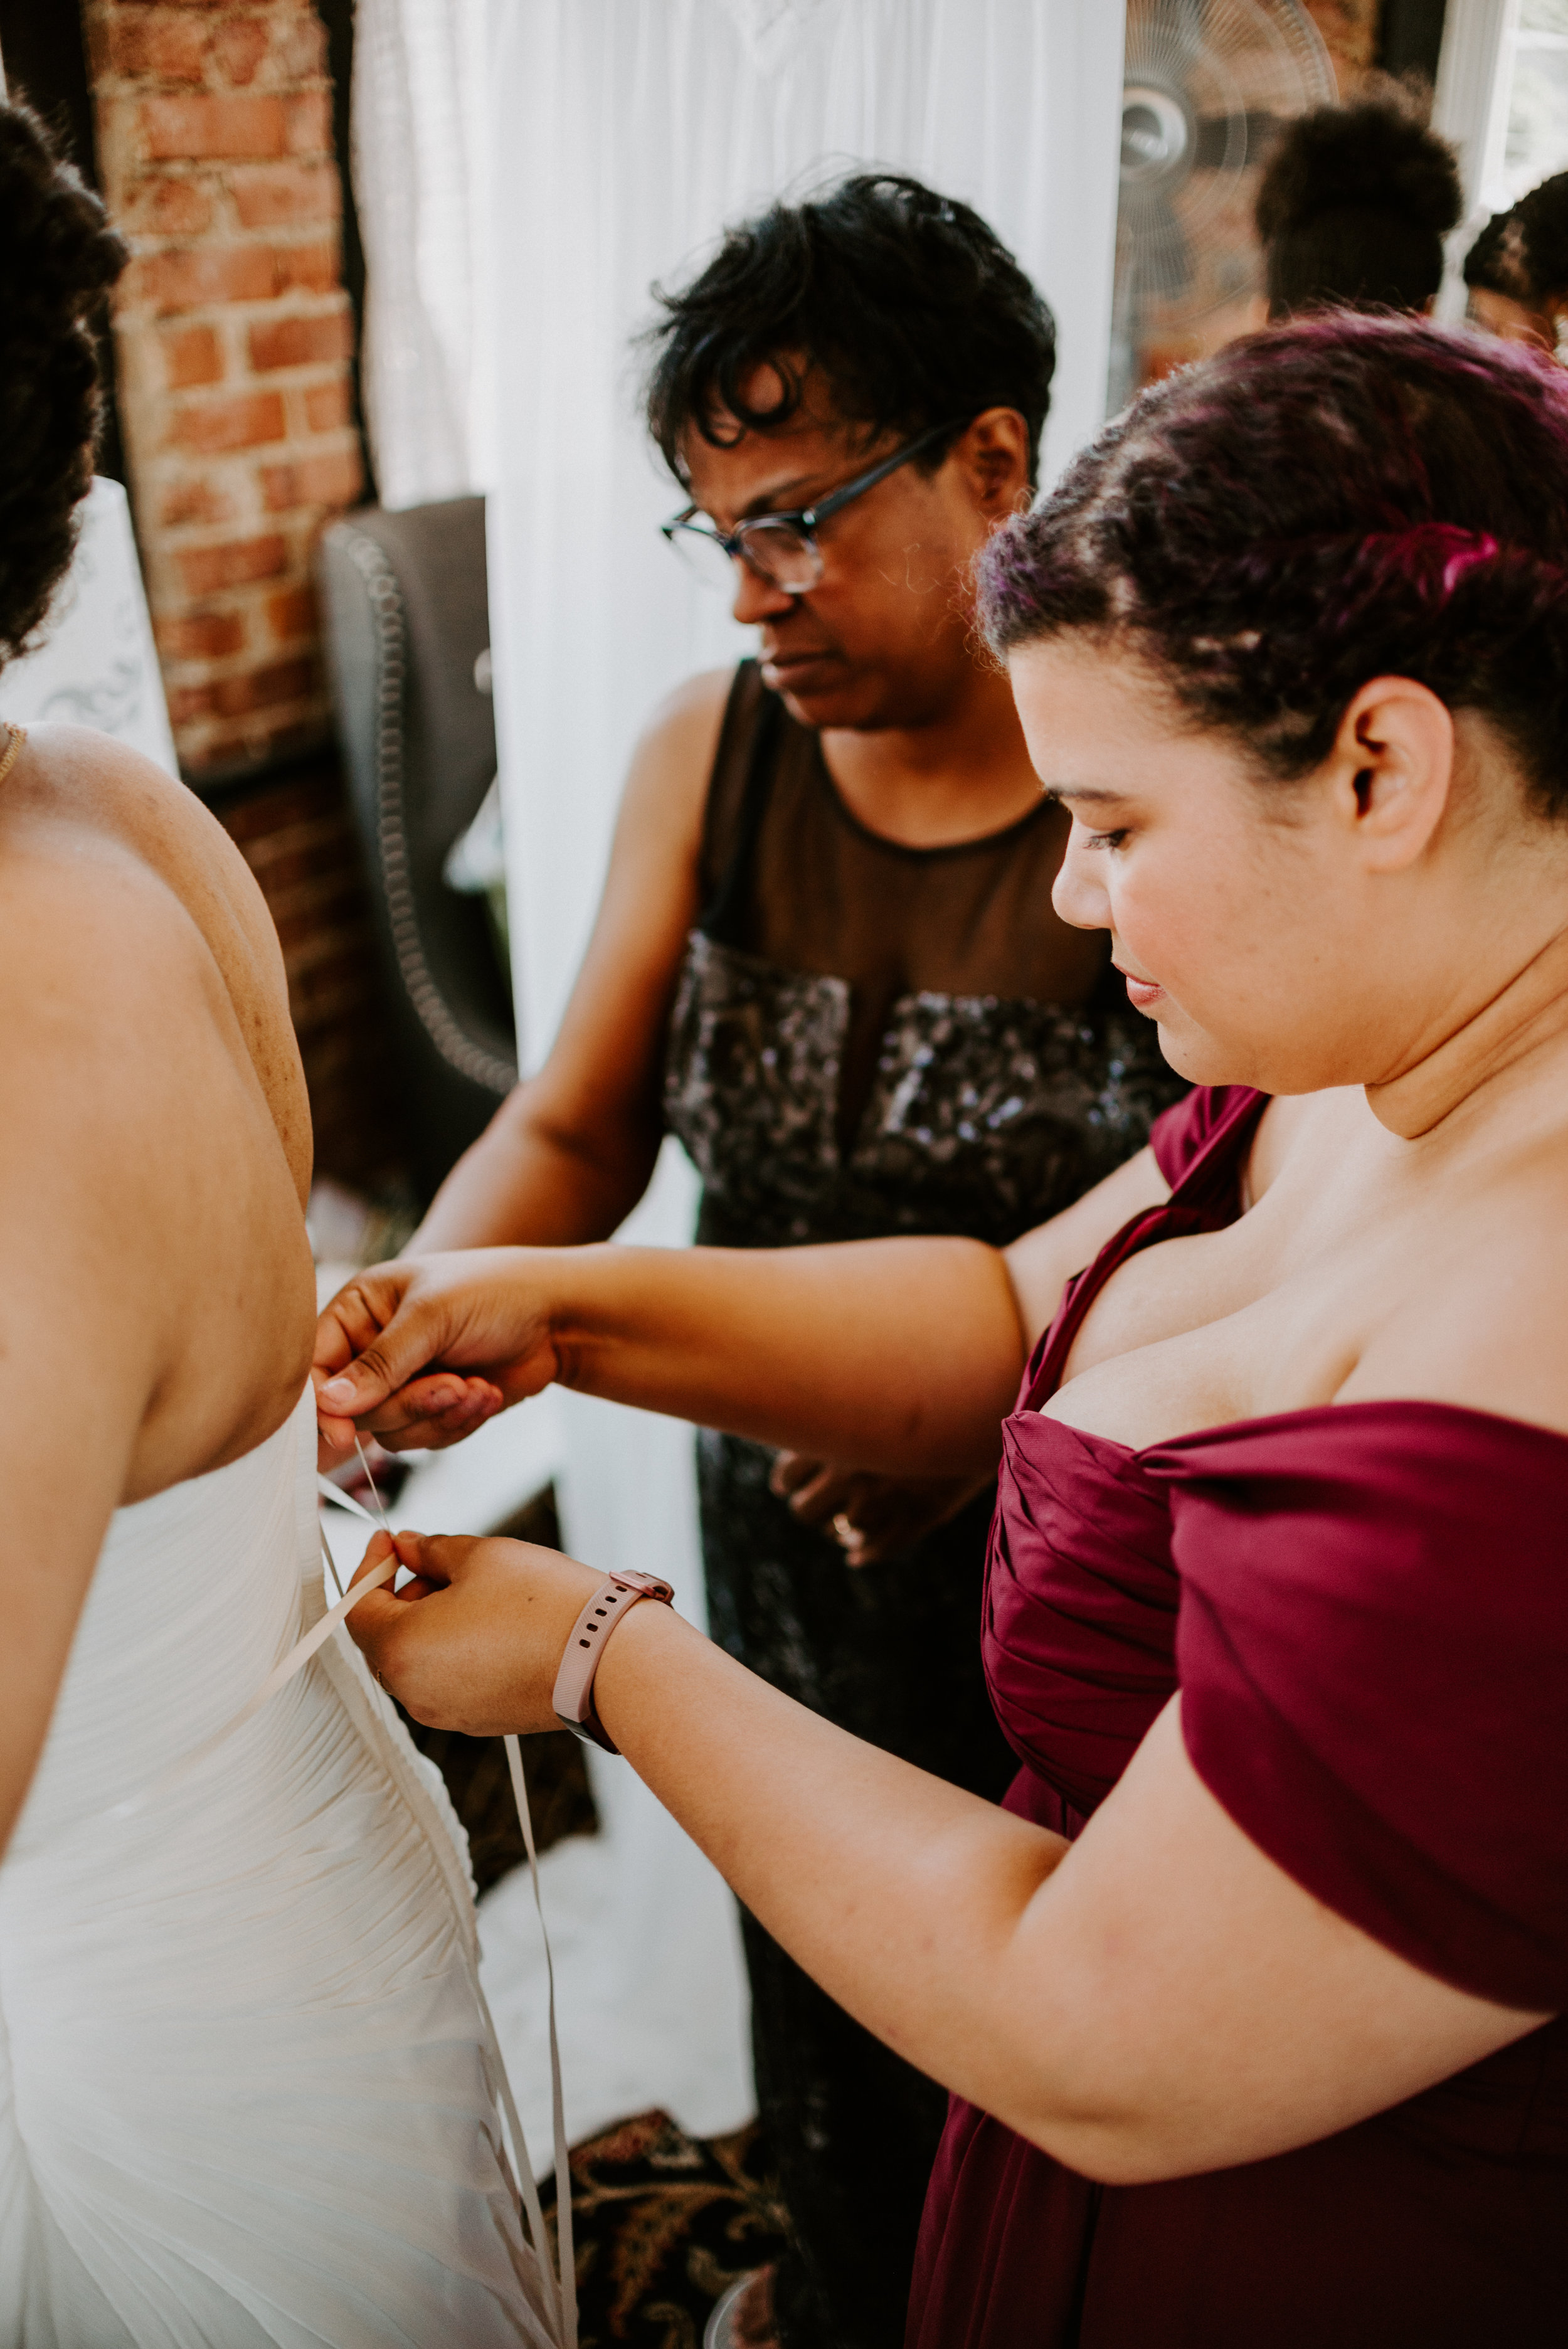 WonderlyCreative_Wedding_6.7.18_Khara&Dwayne_-121.jpg